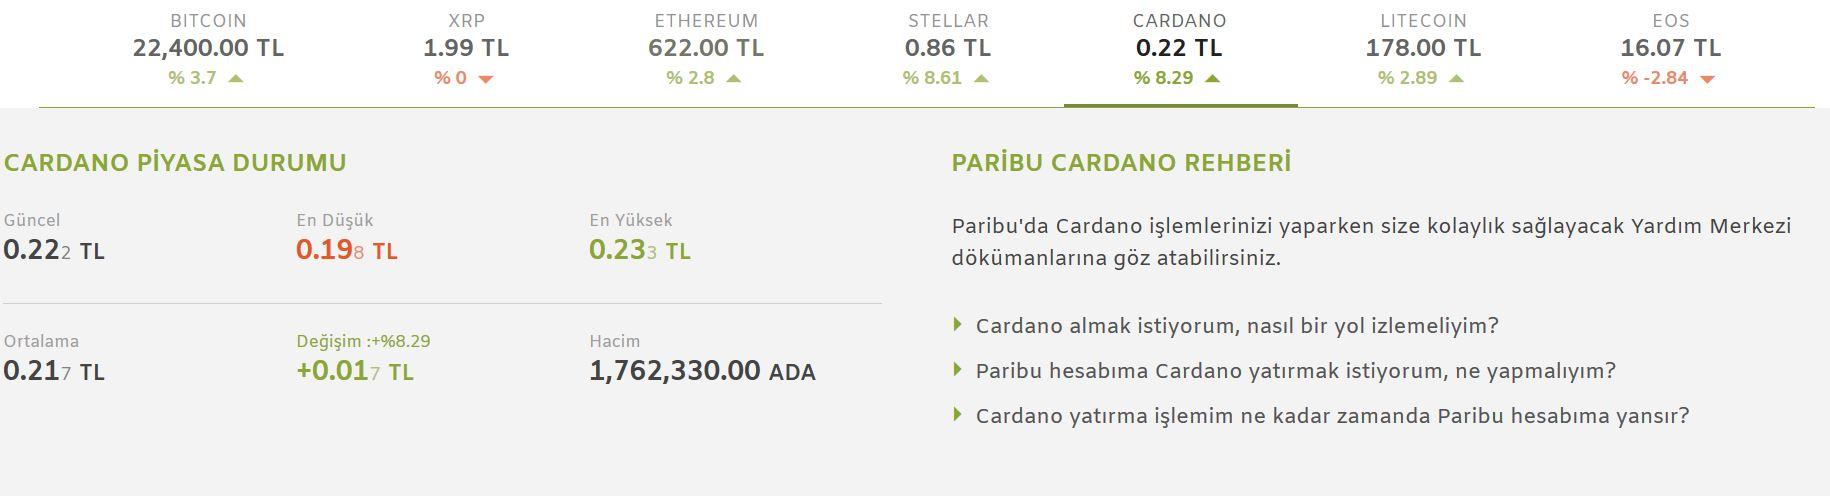 Paribu-Cardano